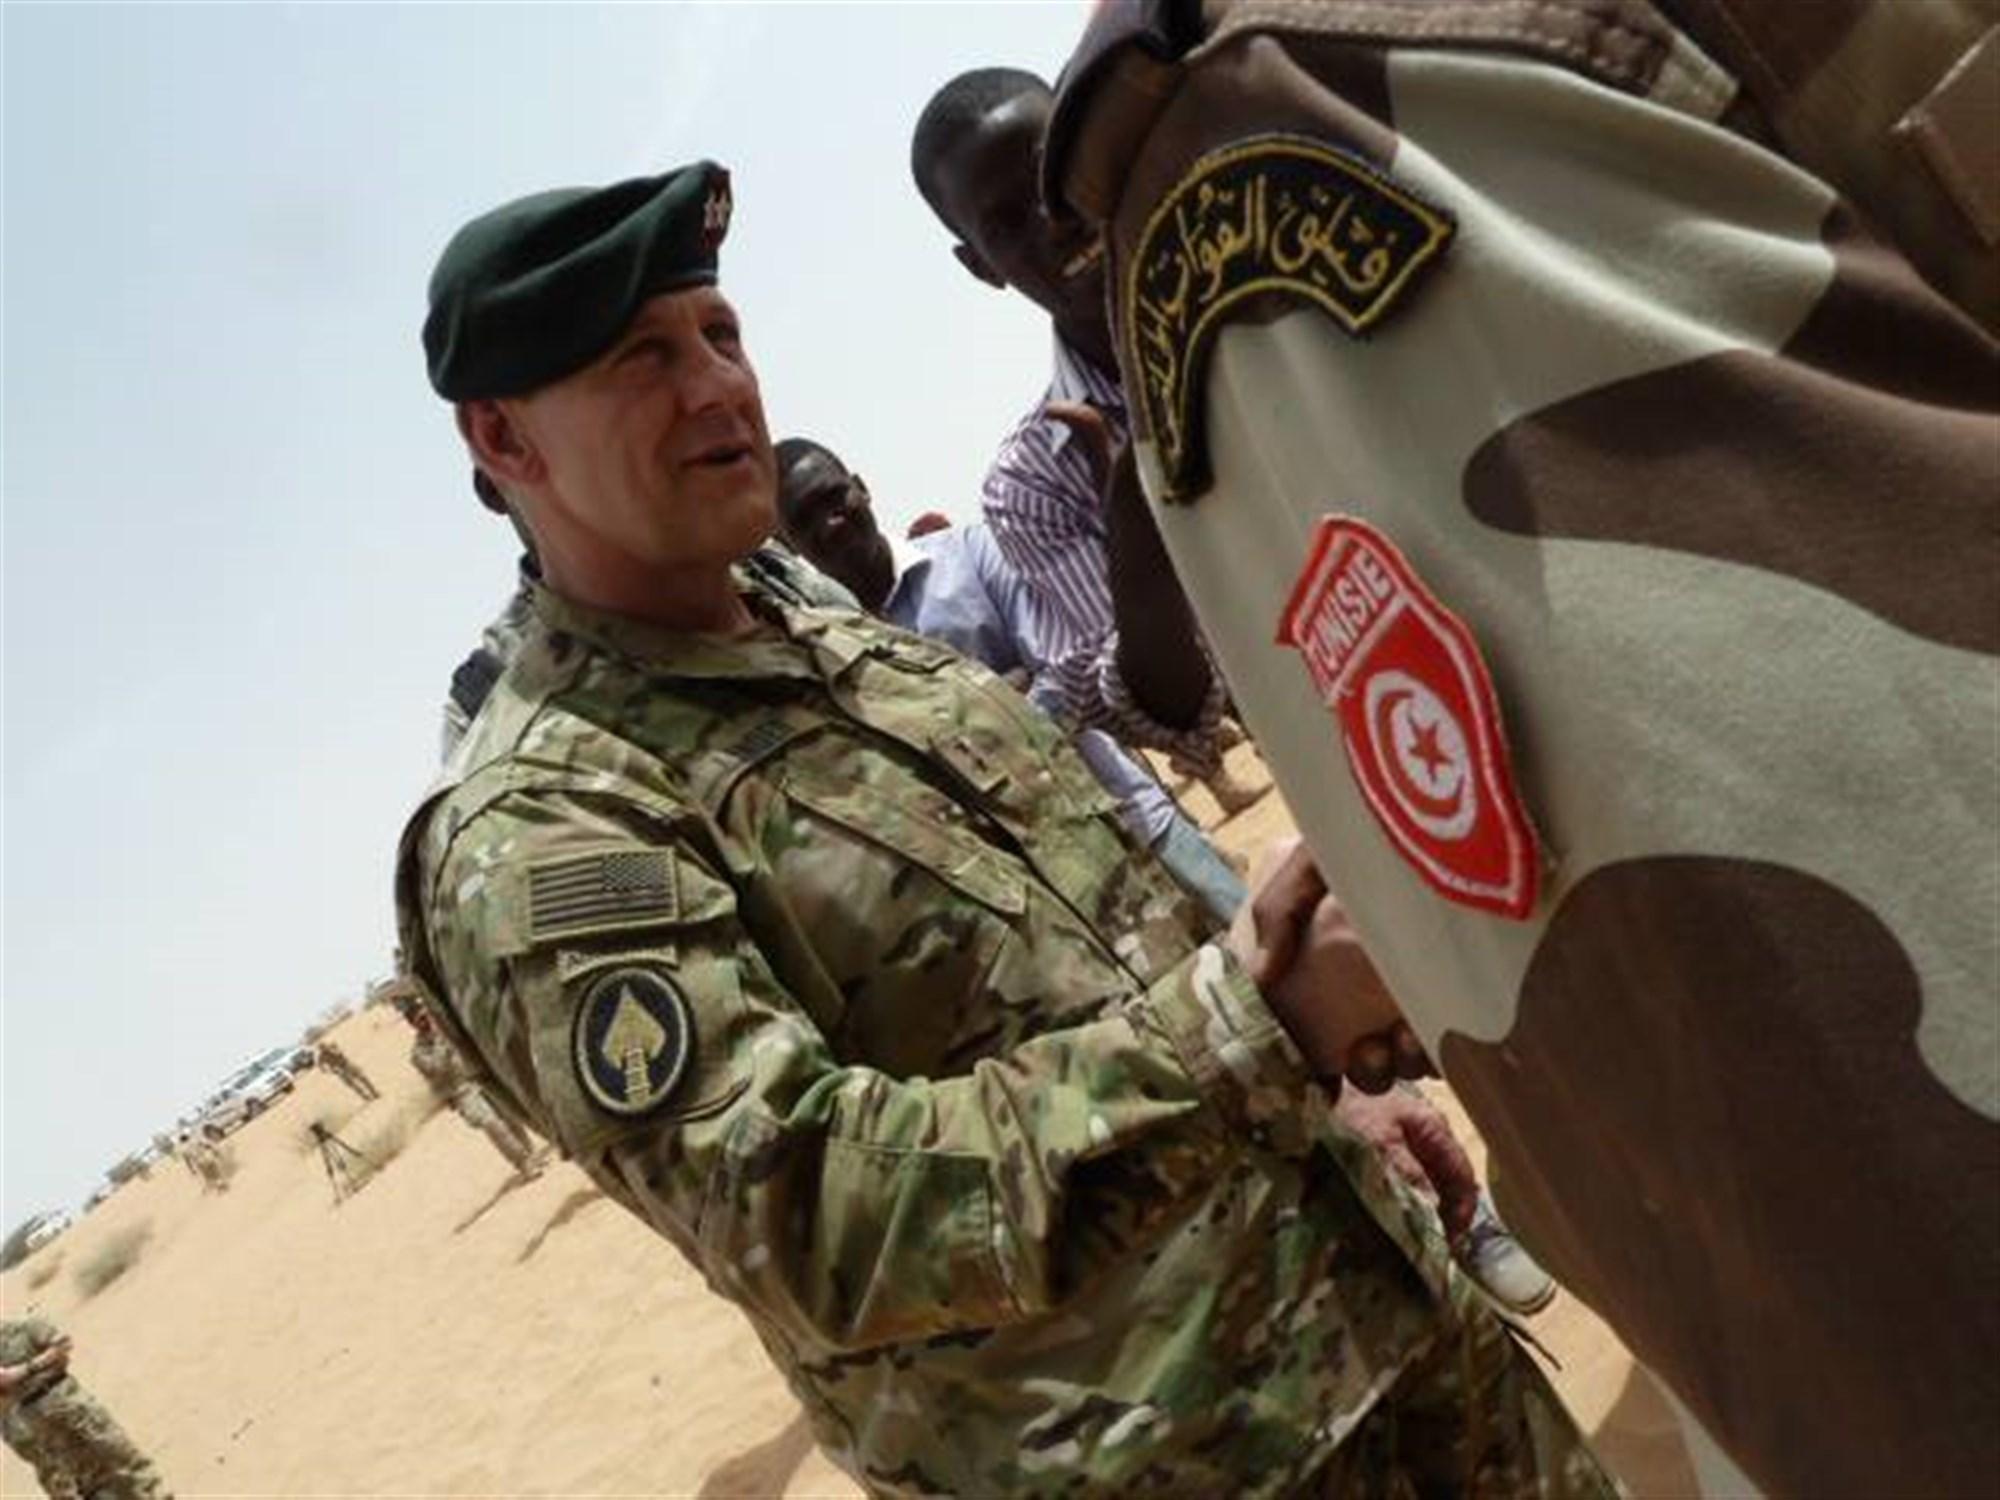 Special Operations Command Africa Commander General, U.S. Army Maj. Gen. James Linder,